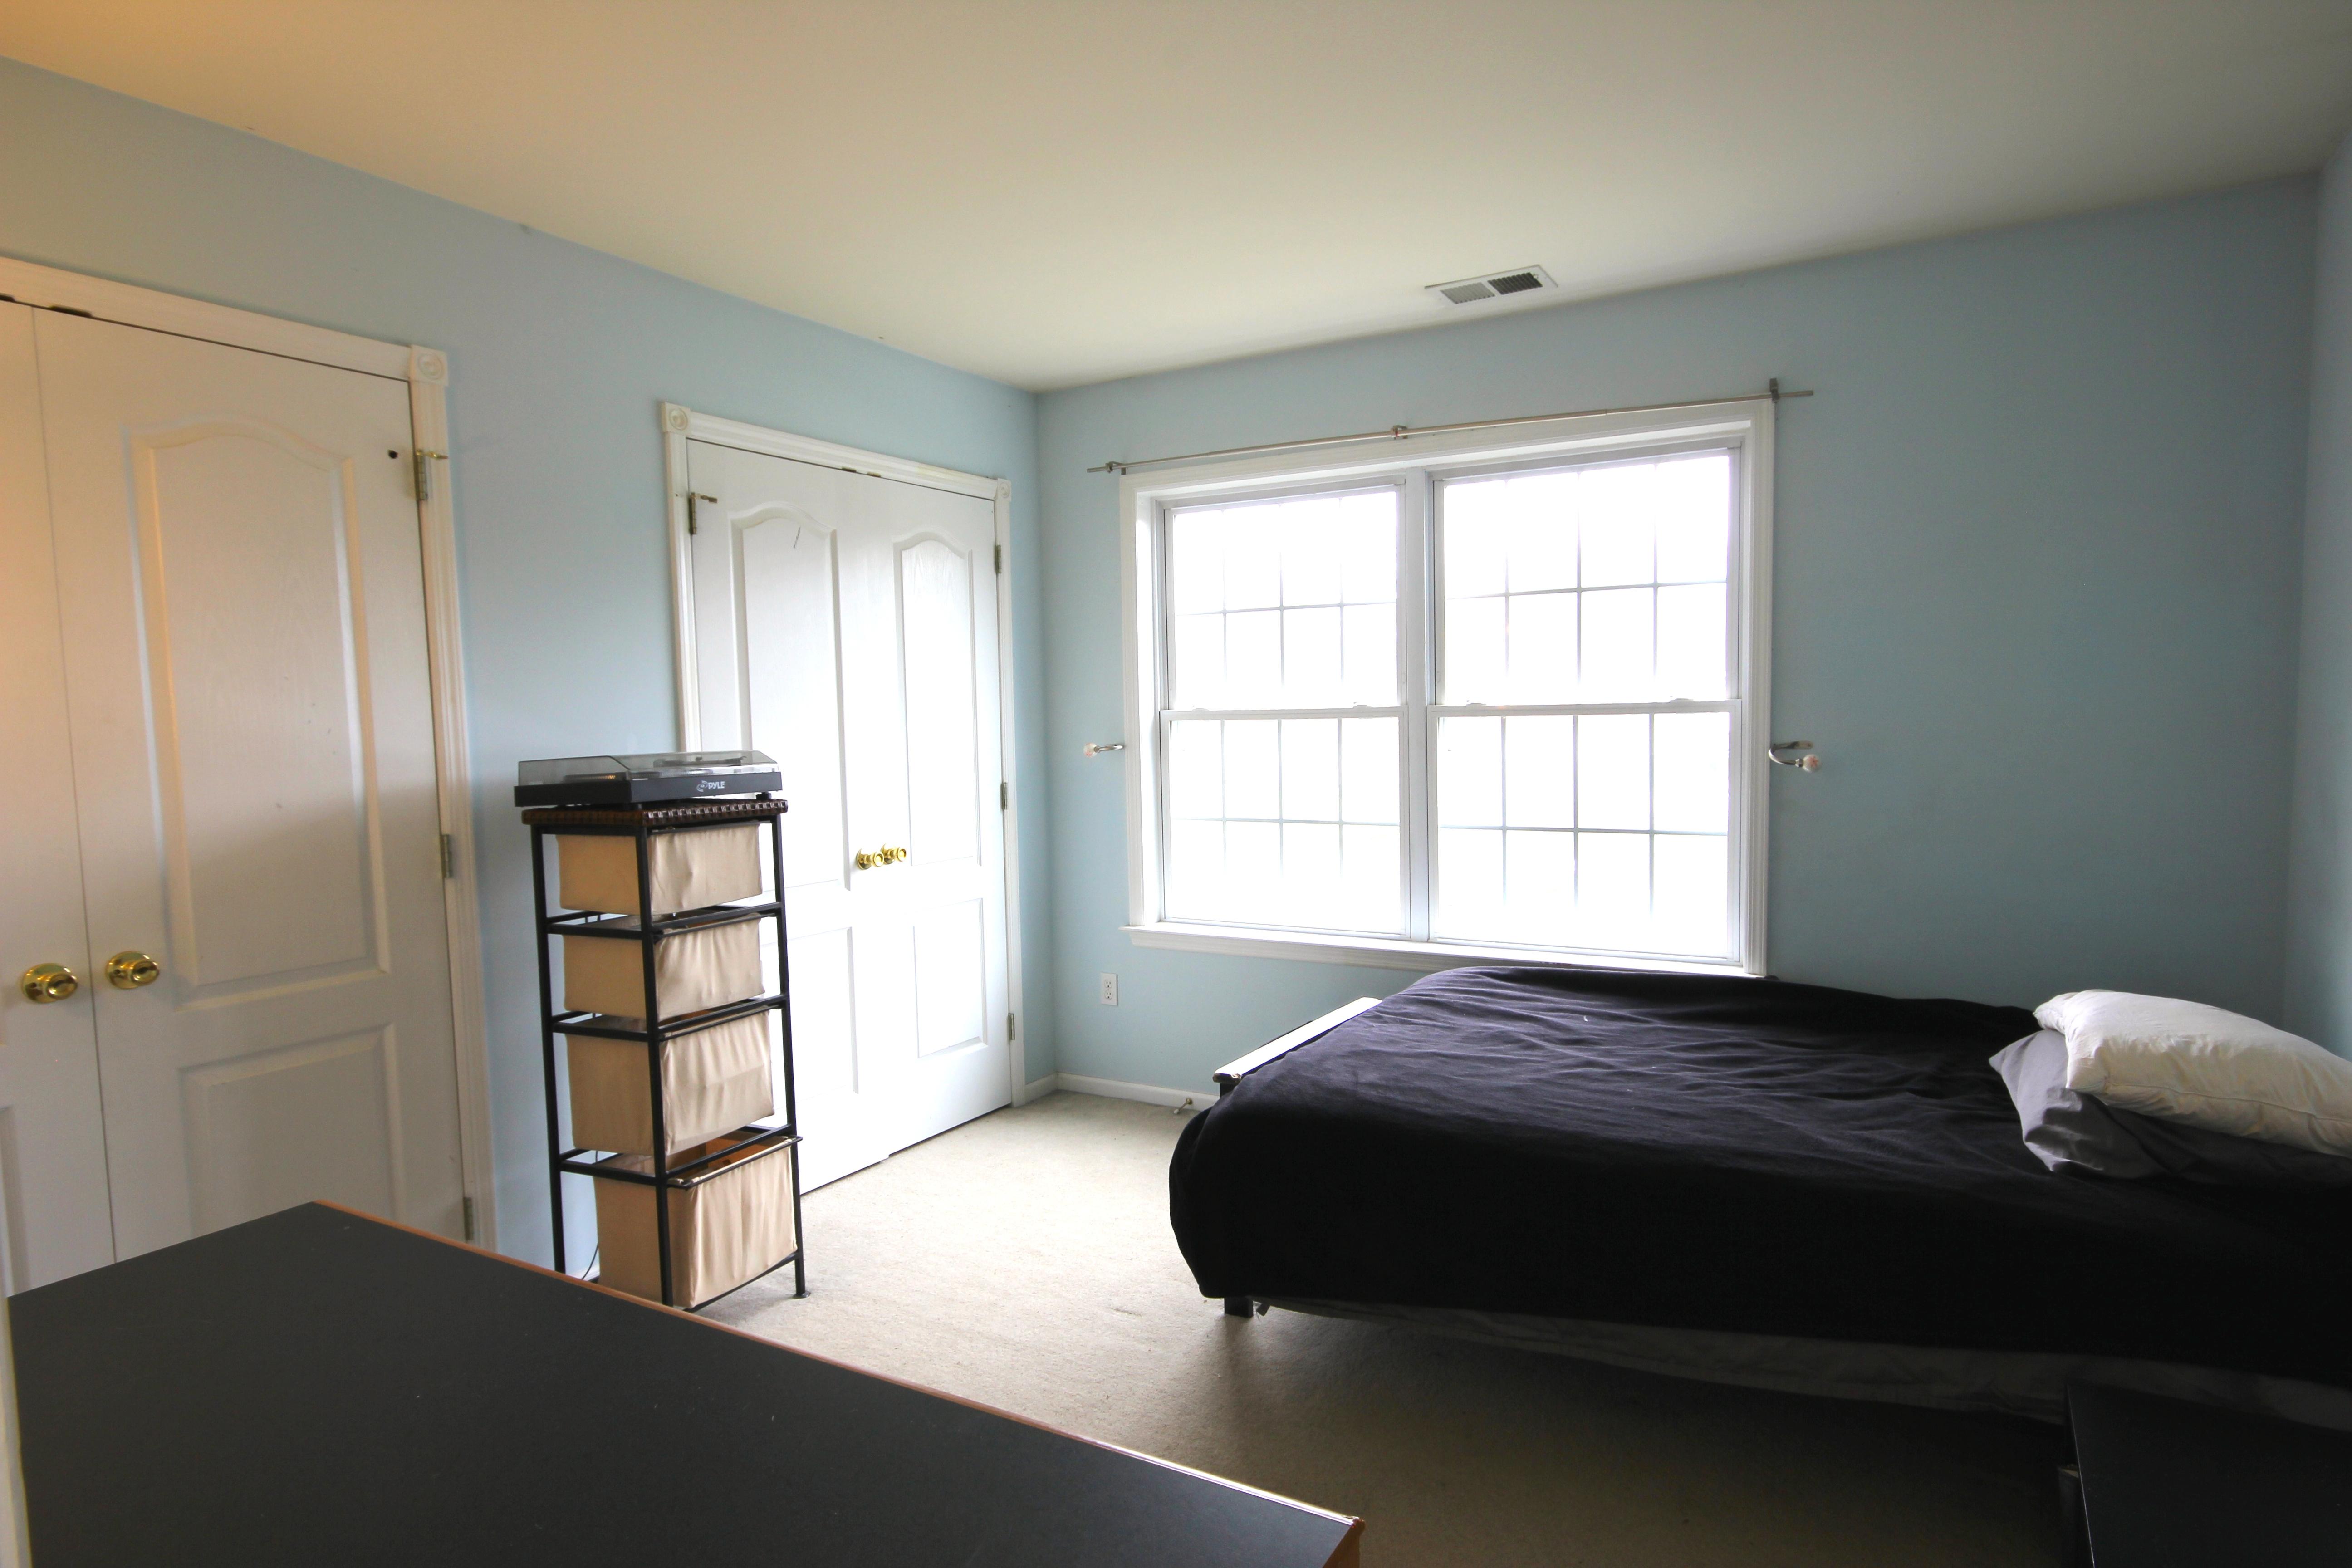 26 Stryker Rd, Somerset, NJ 08873   RealEstate.com